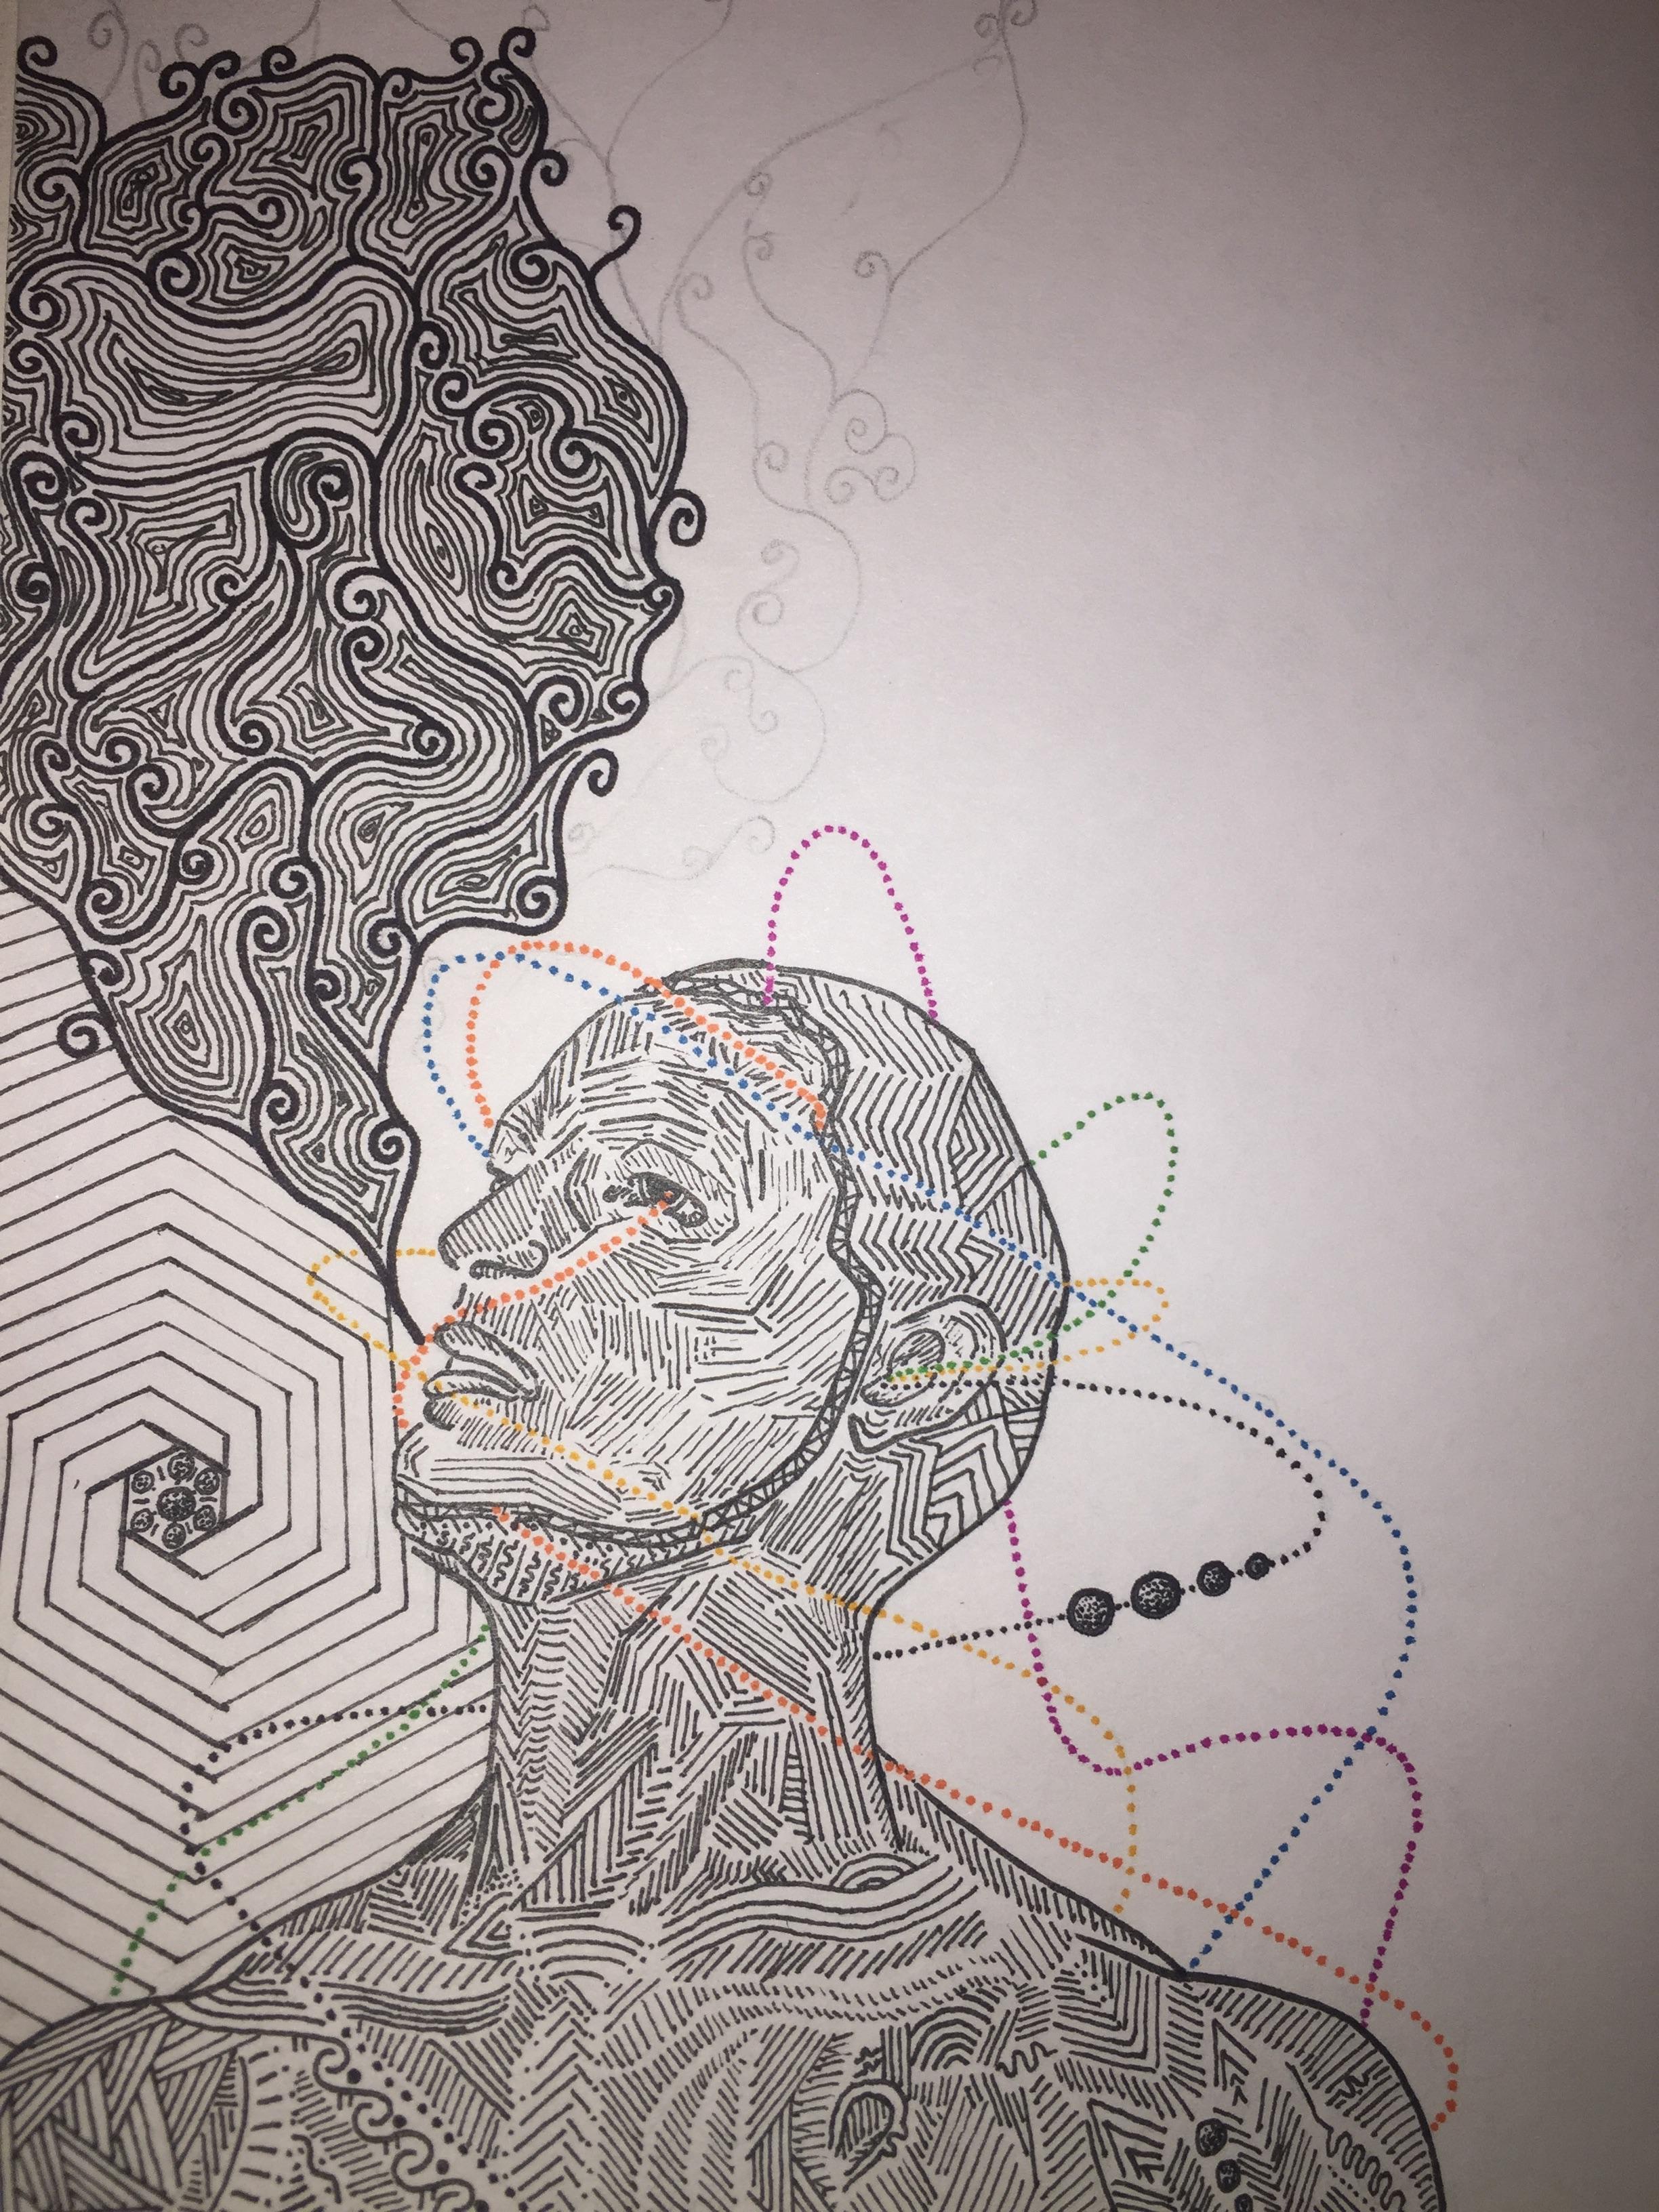 2448x3264 Smoking Weed On Acid [Trip Inspired Drawing] Lsd